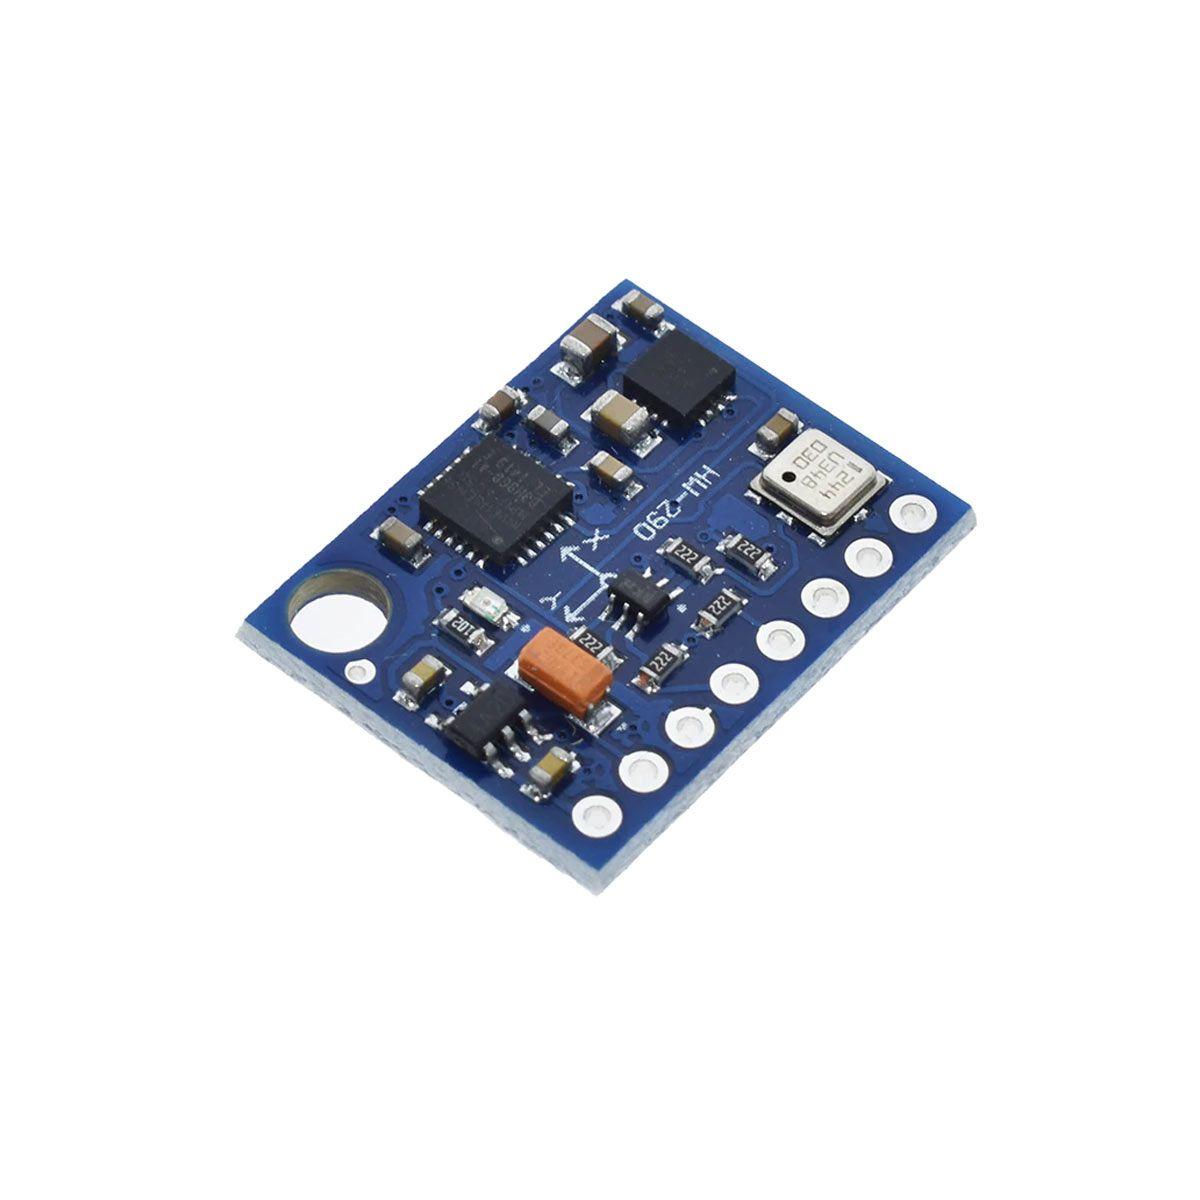 Módulo HW-290 / GY-87 10DOF Imu Sensores: MPU6050 BMP180 HMC5883l